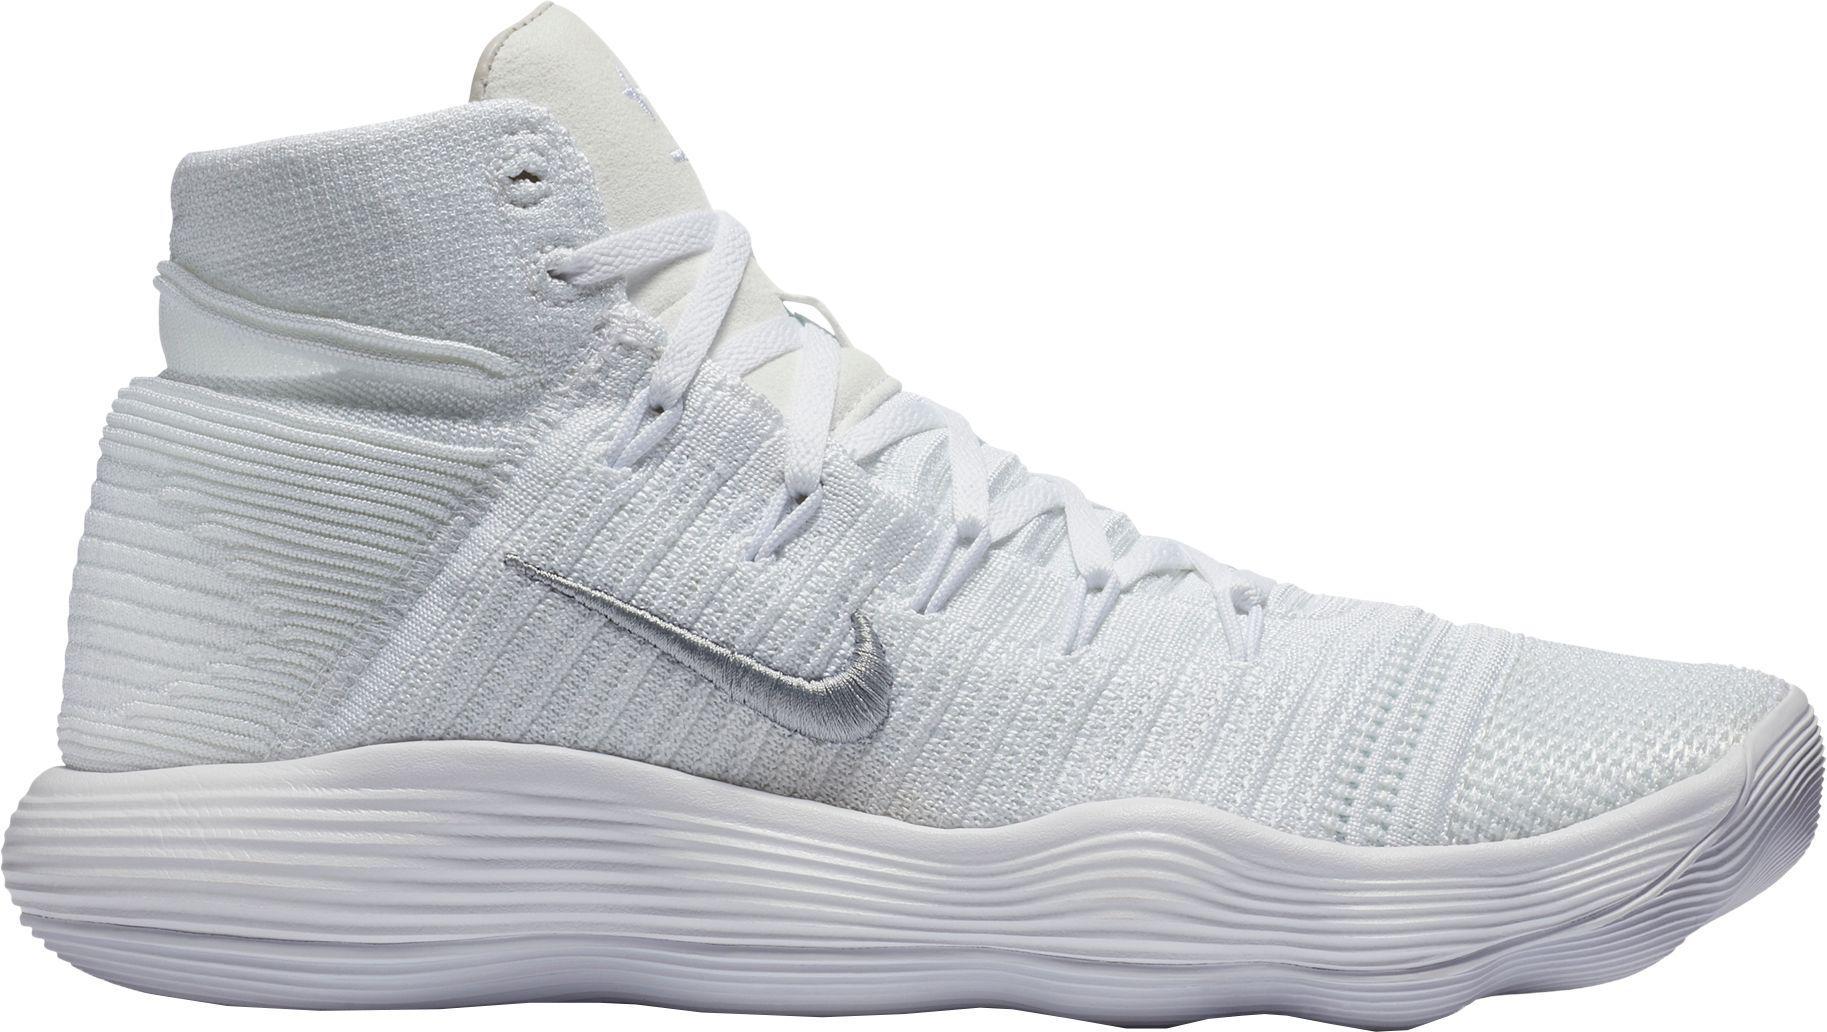 6a5d1ab535dcd Nike - White React Hyperdunk 2017 Flyknit Basketball Shoes for Men - Lyst